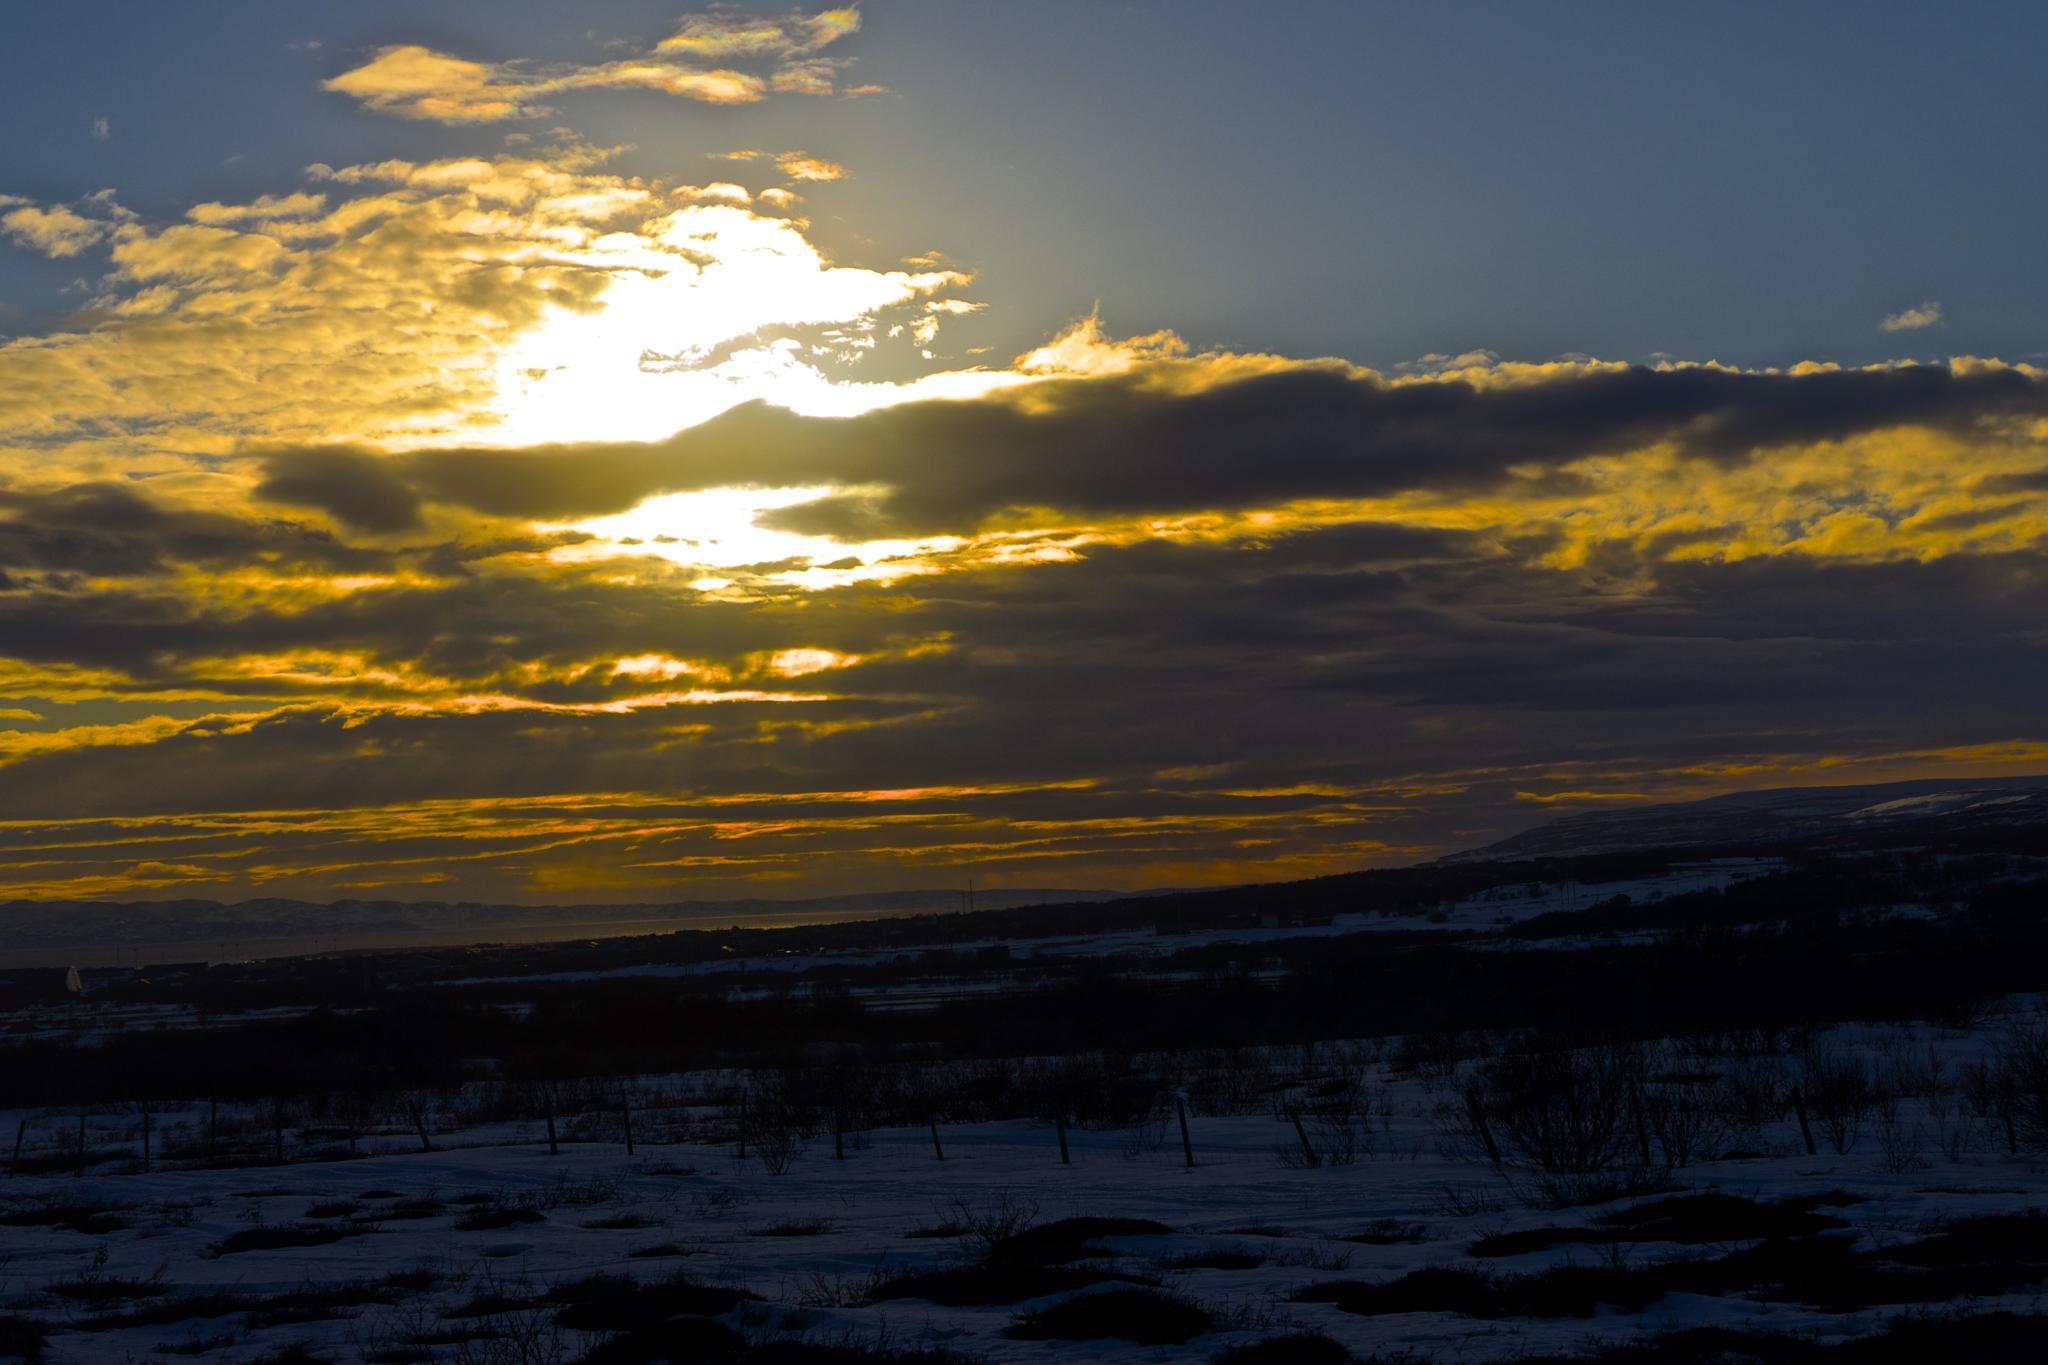 Goodbye Sun by OleFoto